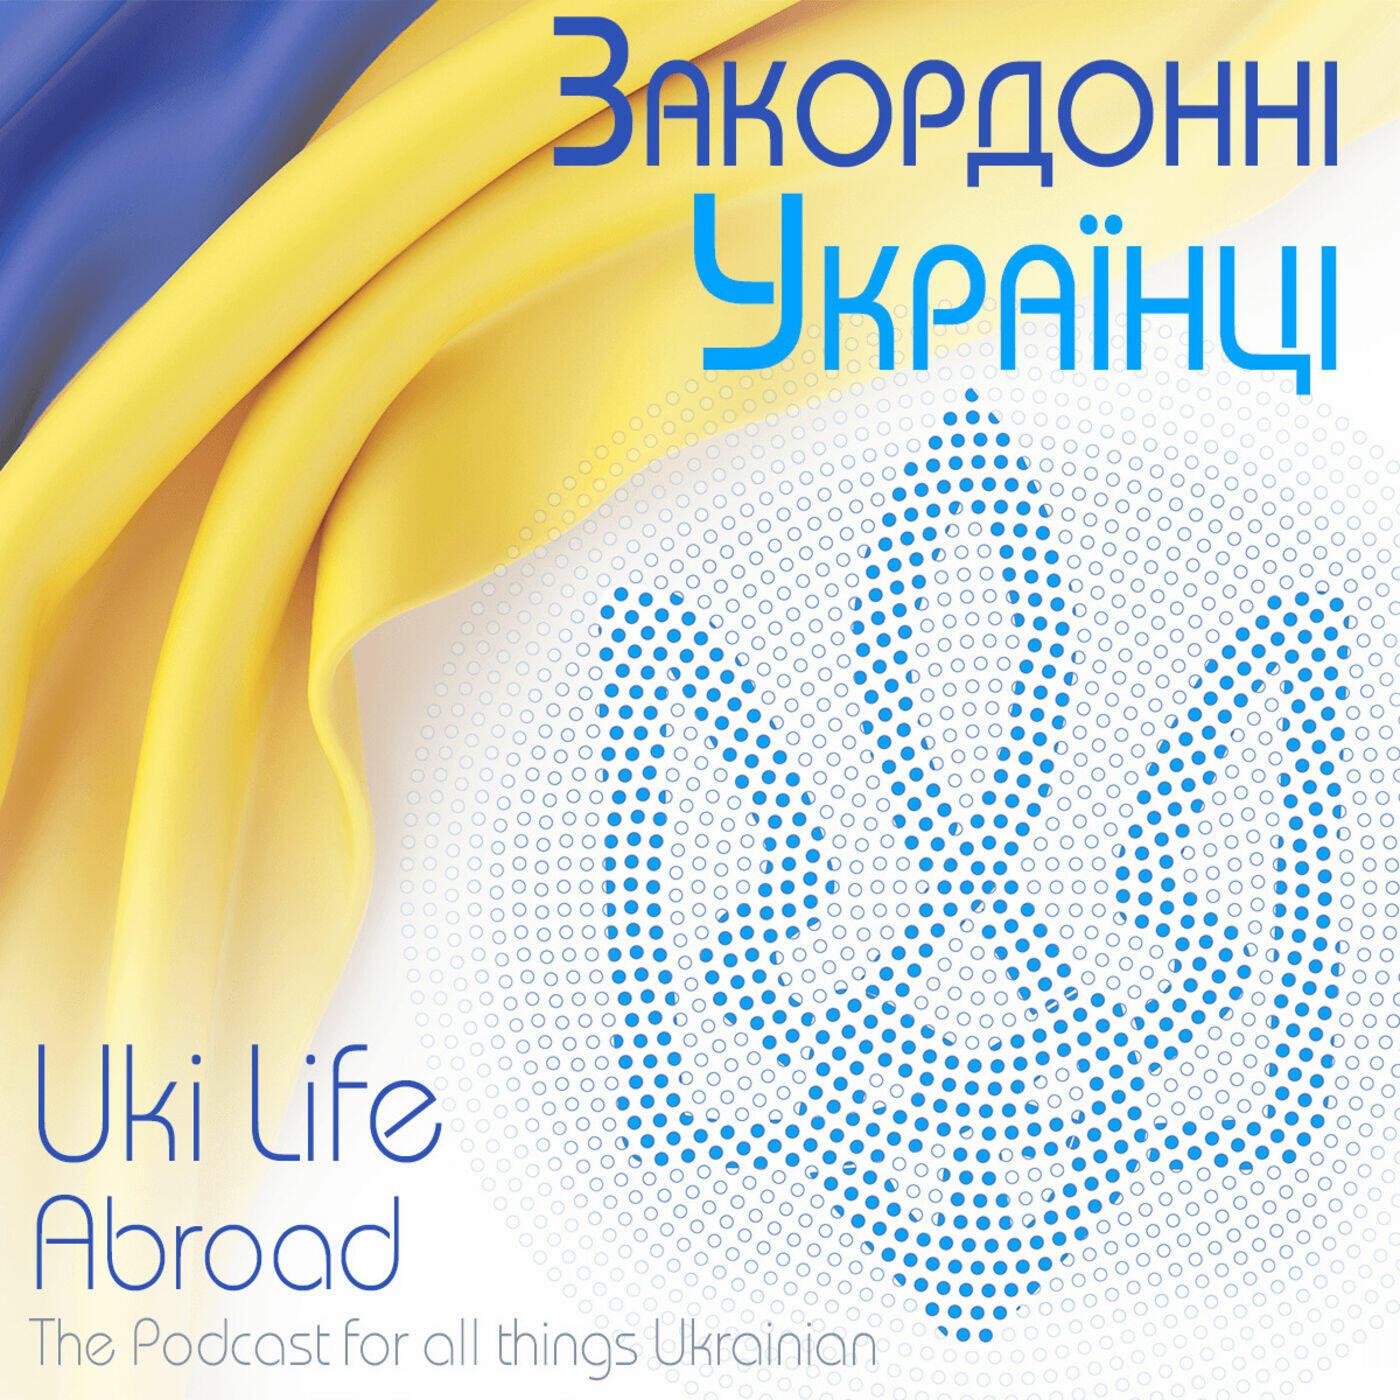 Uki Life Abroad